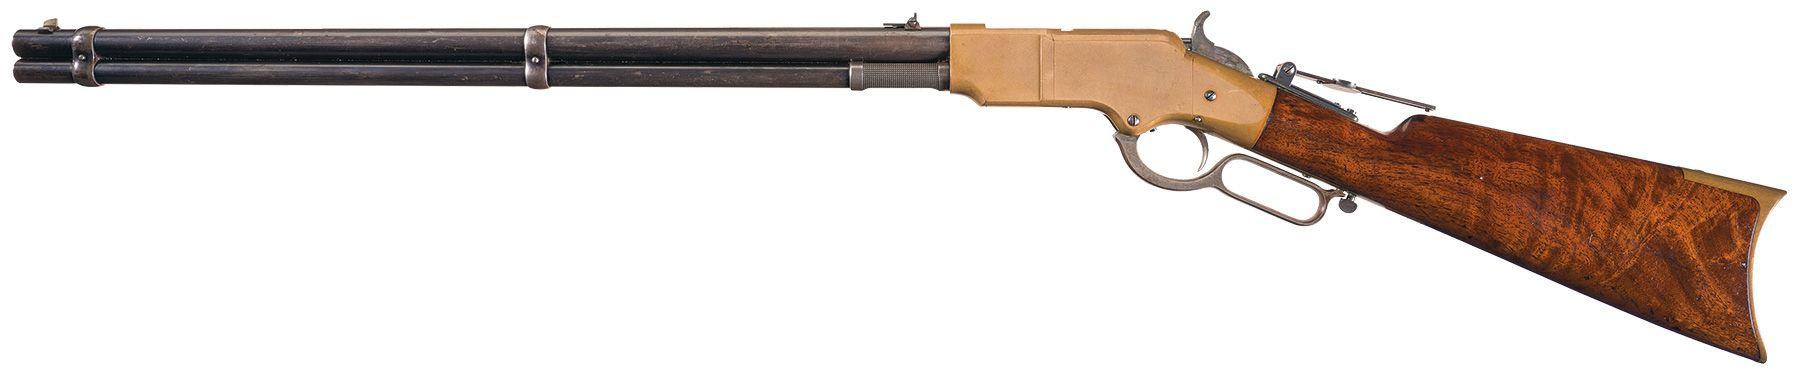 Briggs Patent Henry rifle